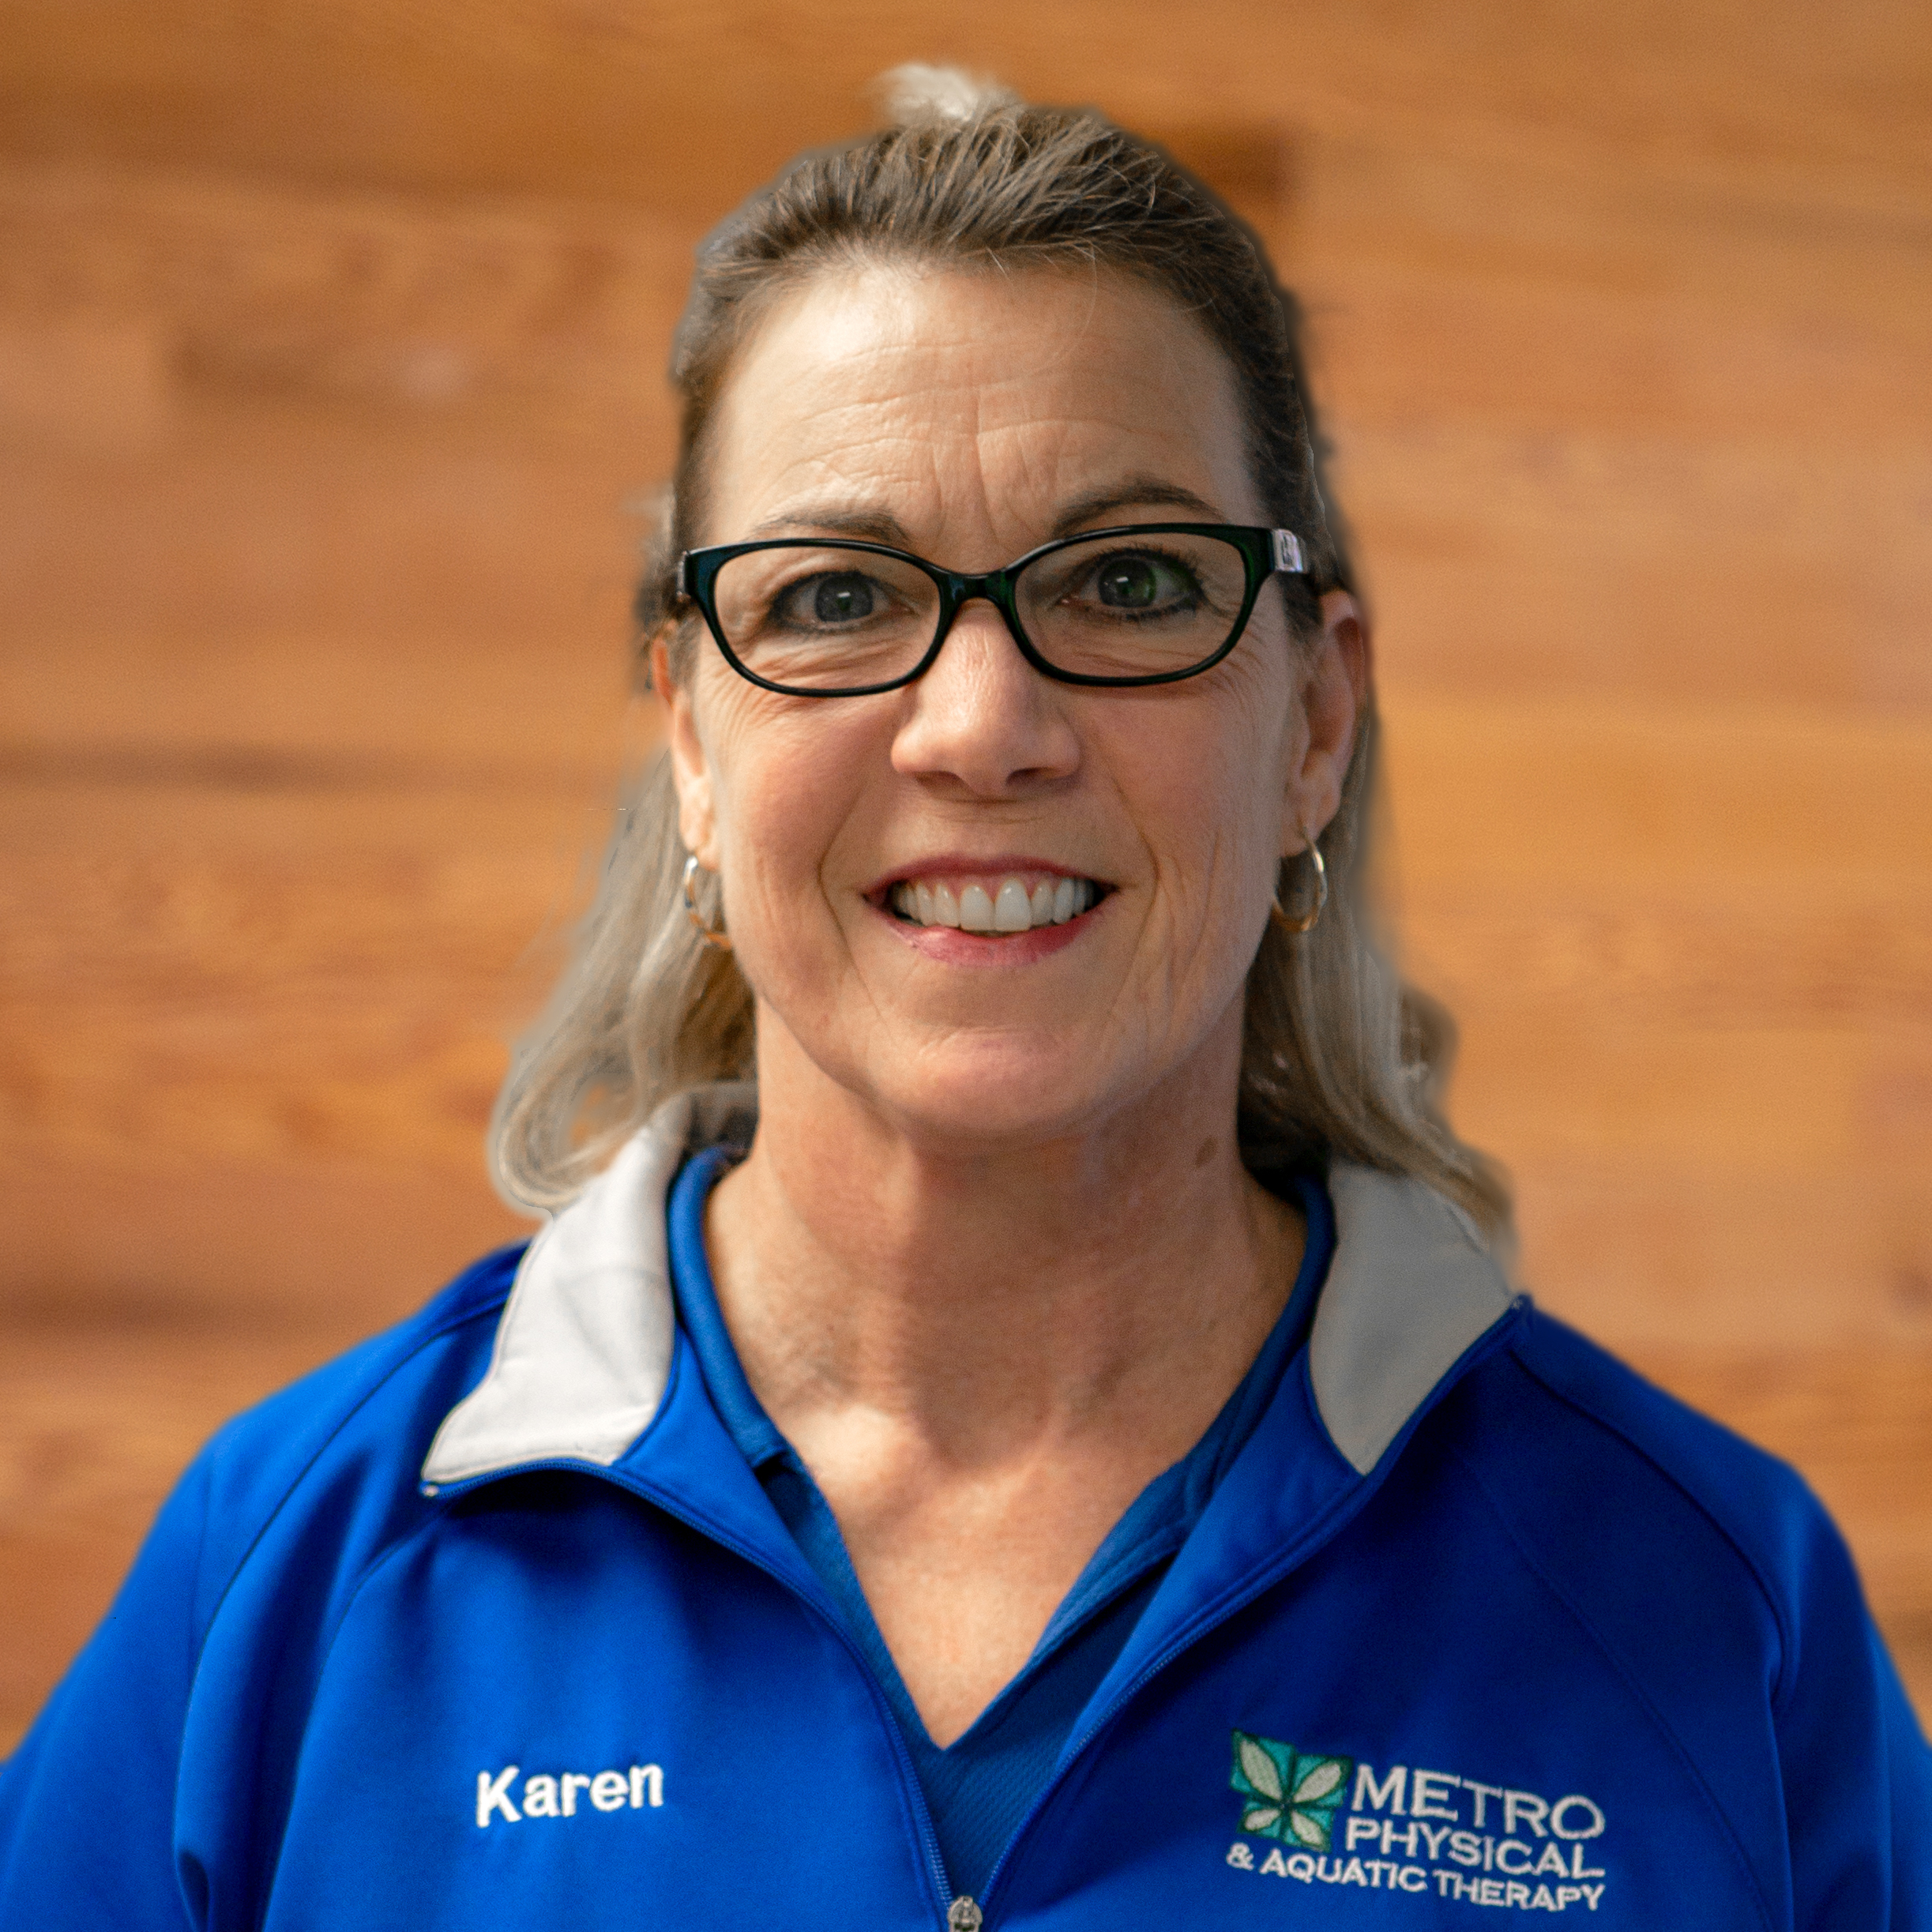 Karen Regan, PTA - Orthopedics & SportsWellness & Prevention